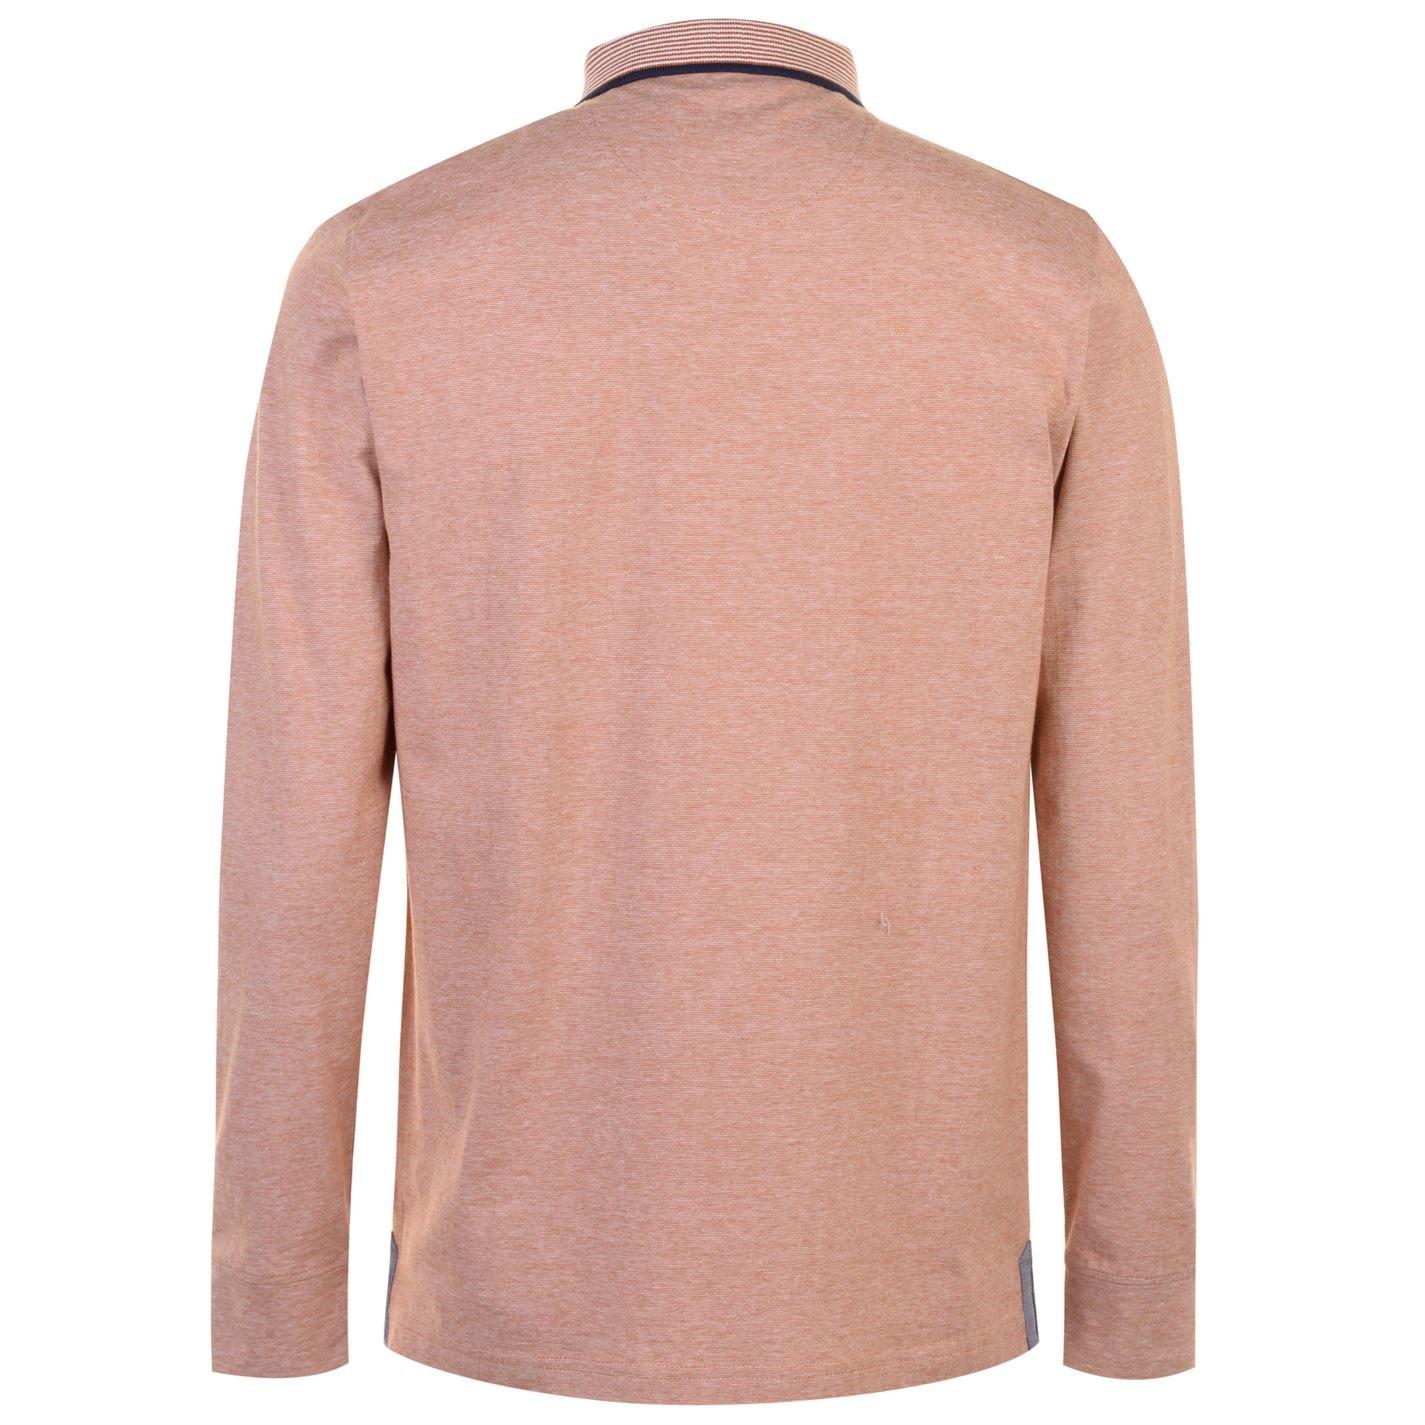 Pierre Cardin Hombre Yarn Dye Camisa Polo Manga Larga Rust/Blanco ...